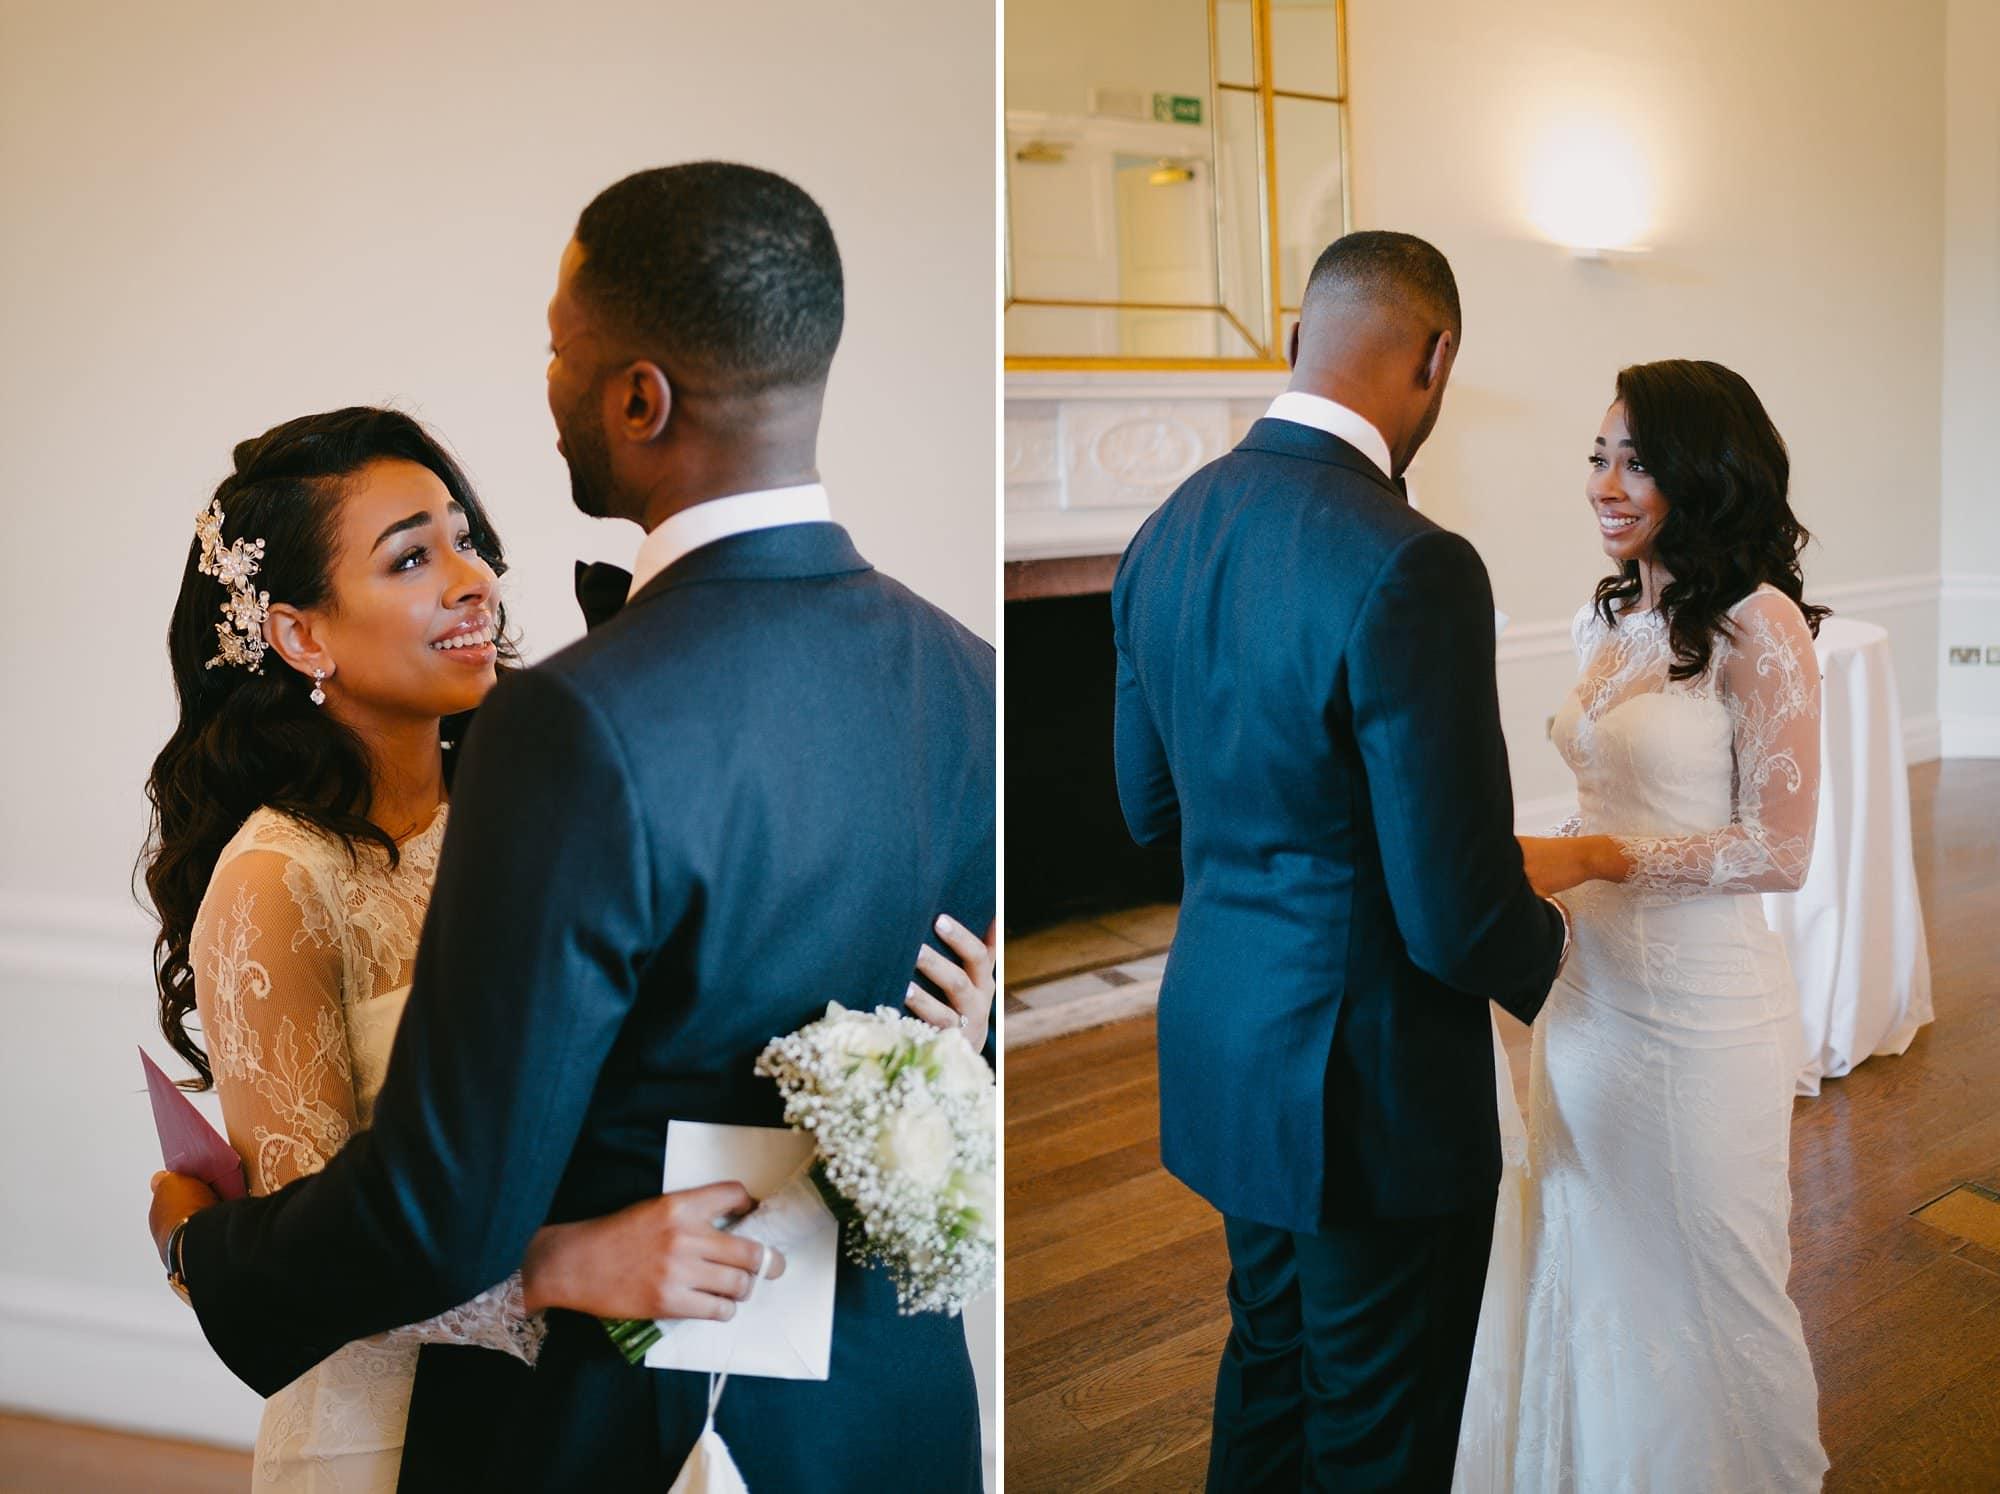 asia house london wedding photographer 004 - Rachel + Gabriel   Asia House Wedding Photography